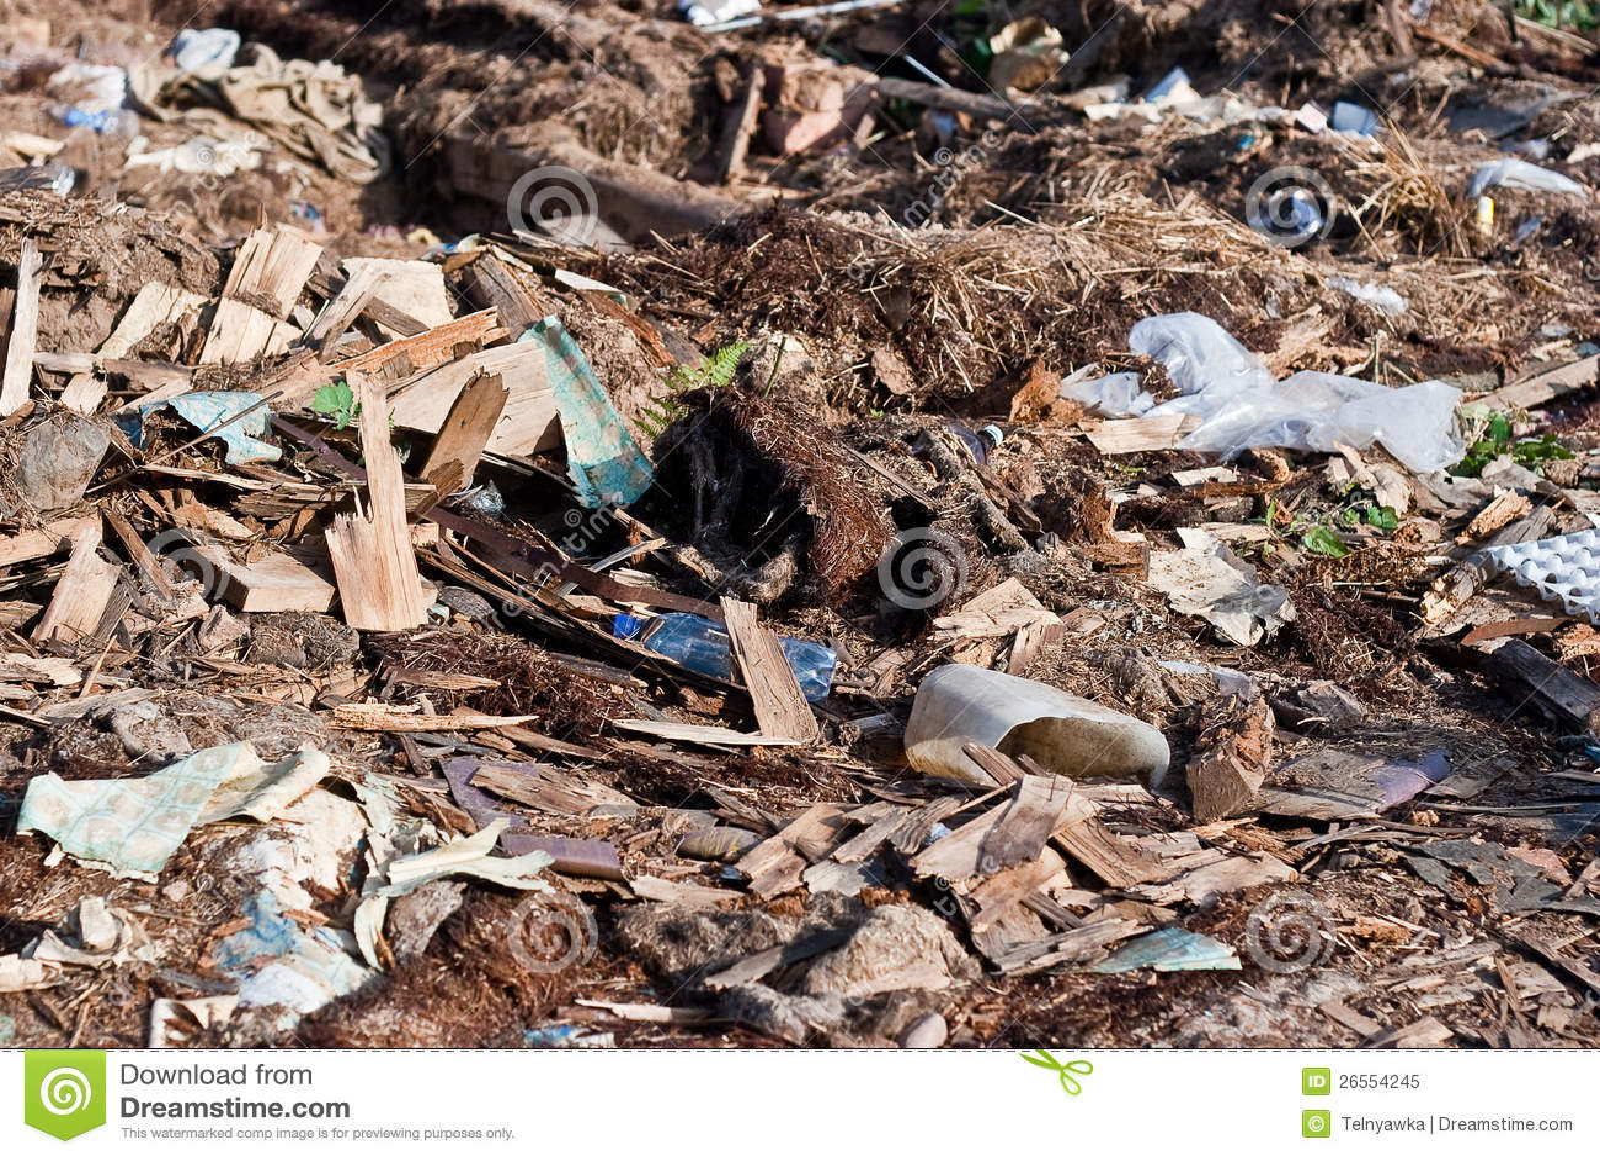 Pile Of Building Debris : A pile of debris royalty free stock photo image